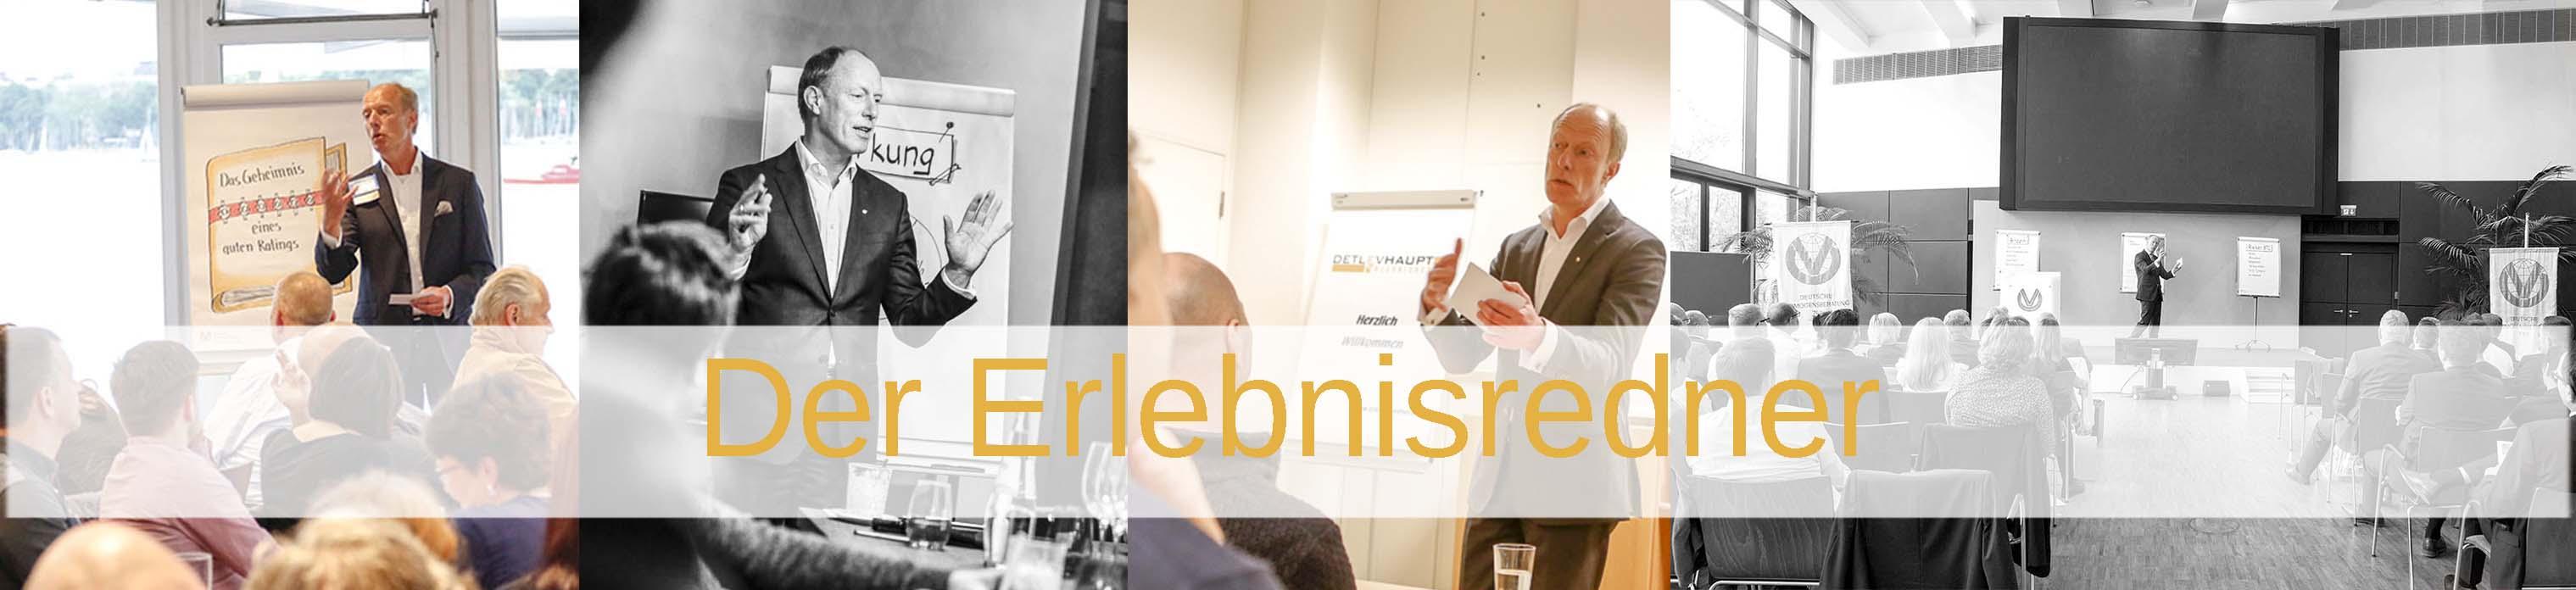 Detlev_Haupt_Erlebnisredner_Speaker, Redner, Workshops